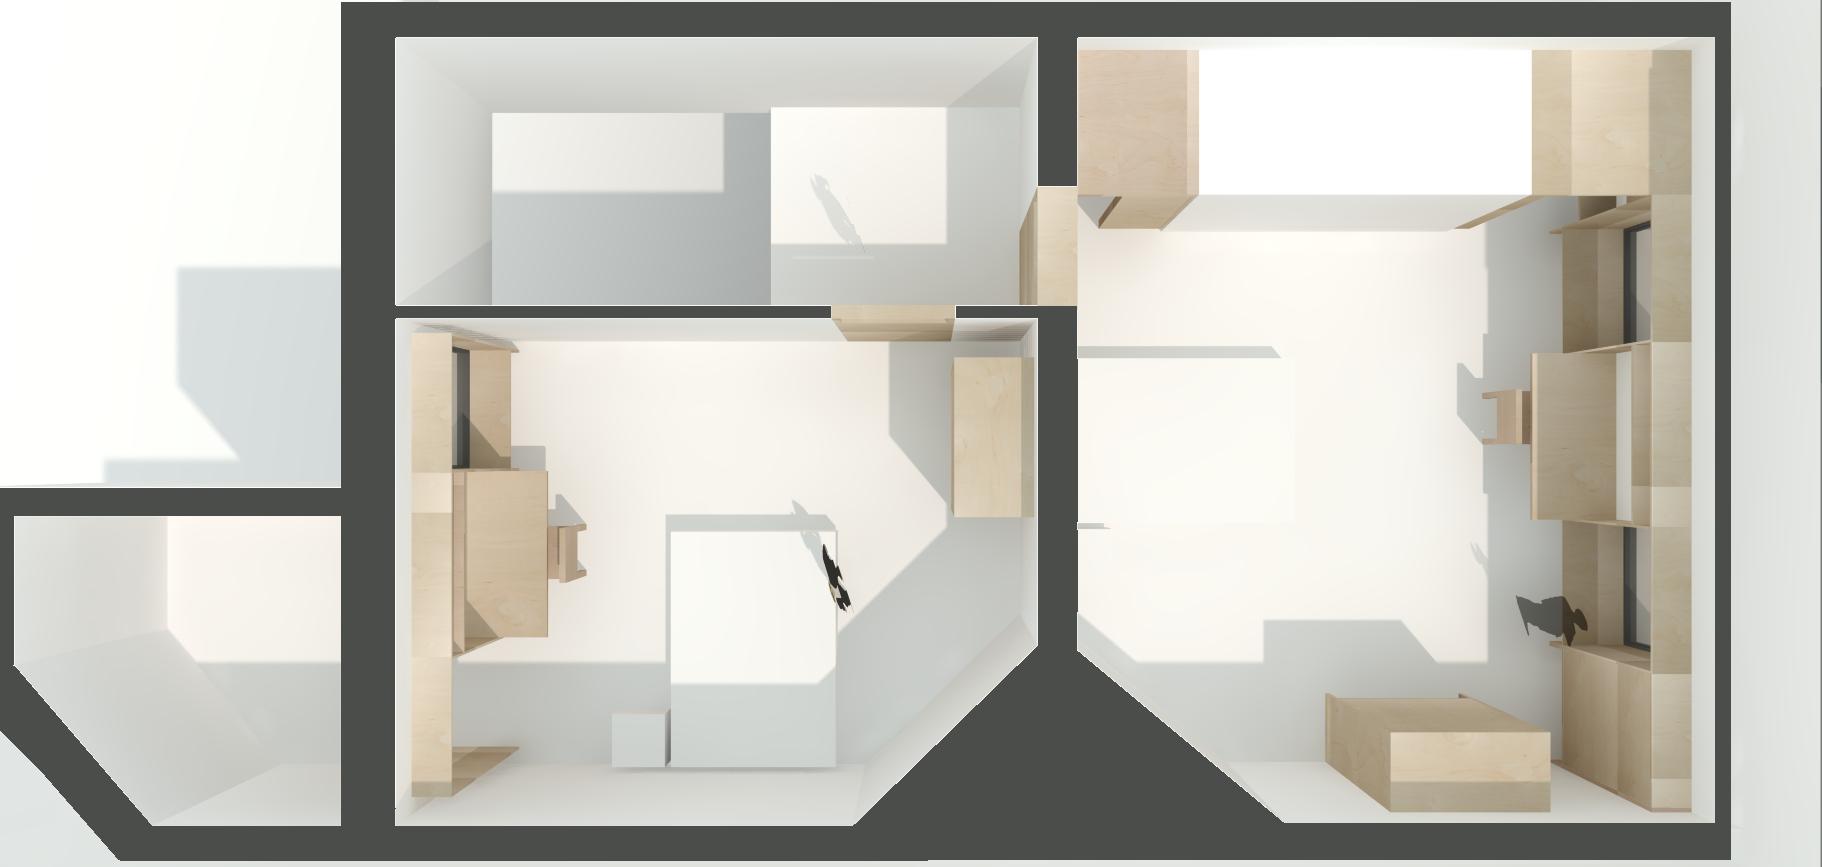 BRENNAN_FURLONG_BOLTON_STREET_SECOND FLOOR PLAN_3D.jpg